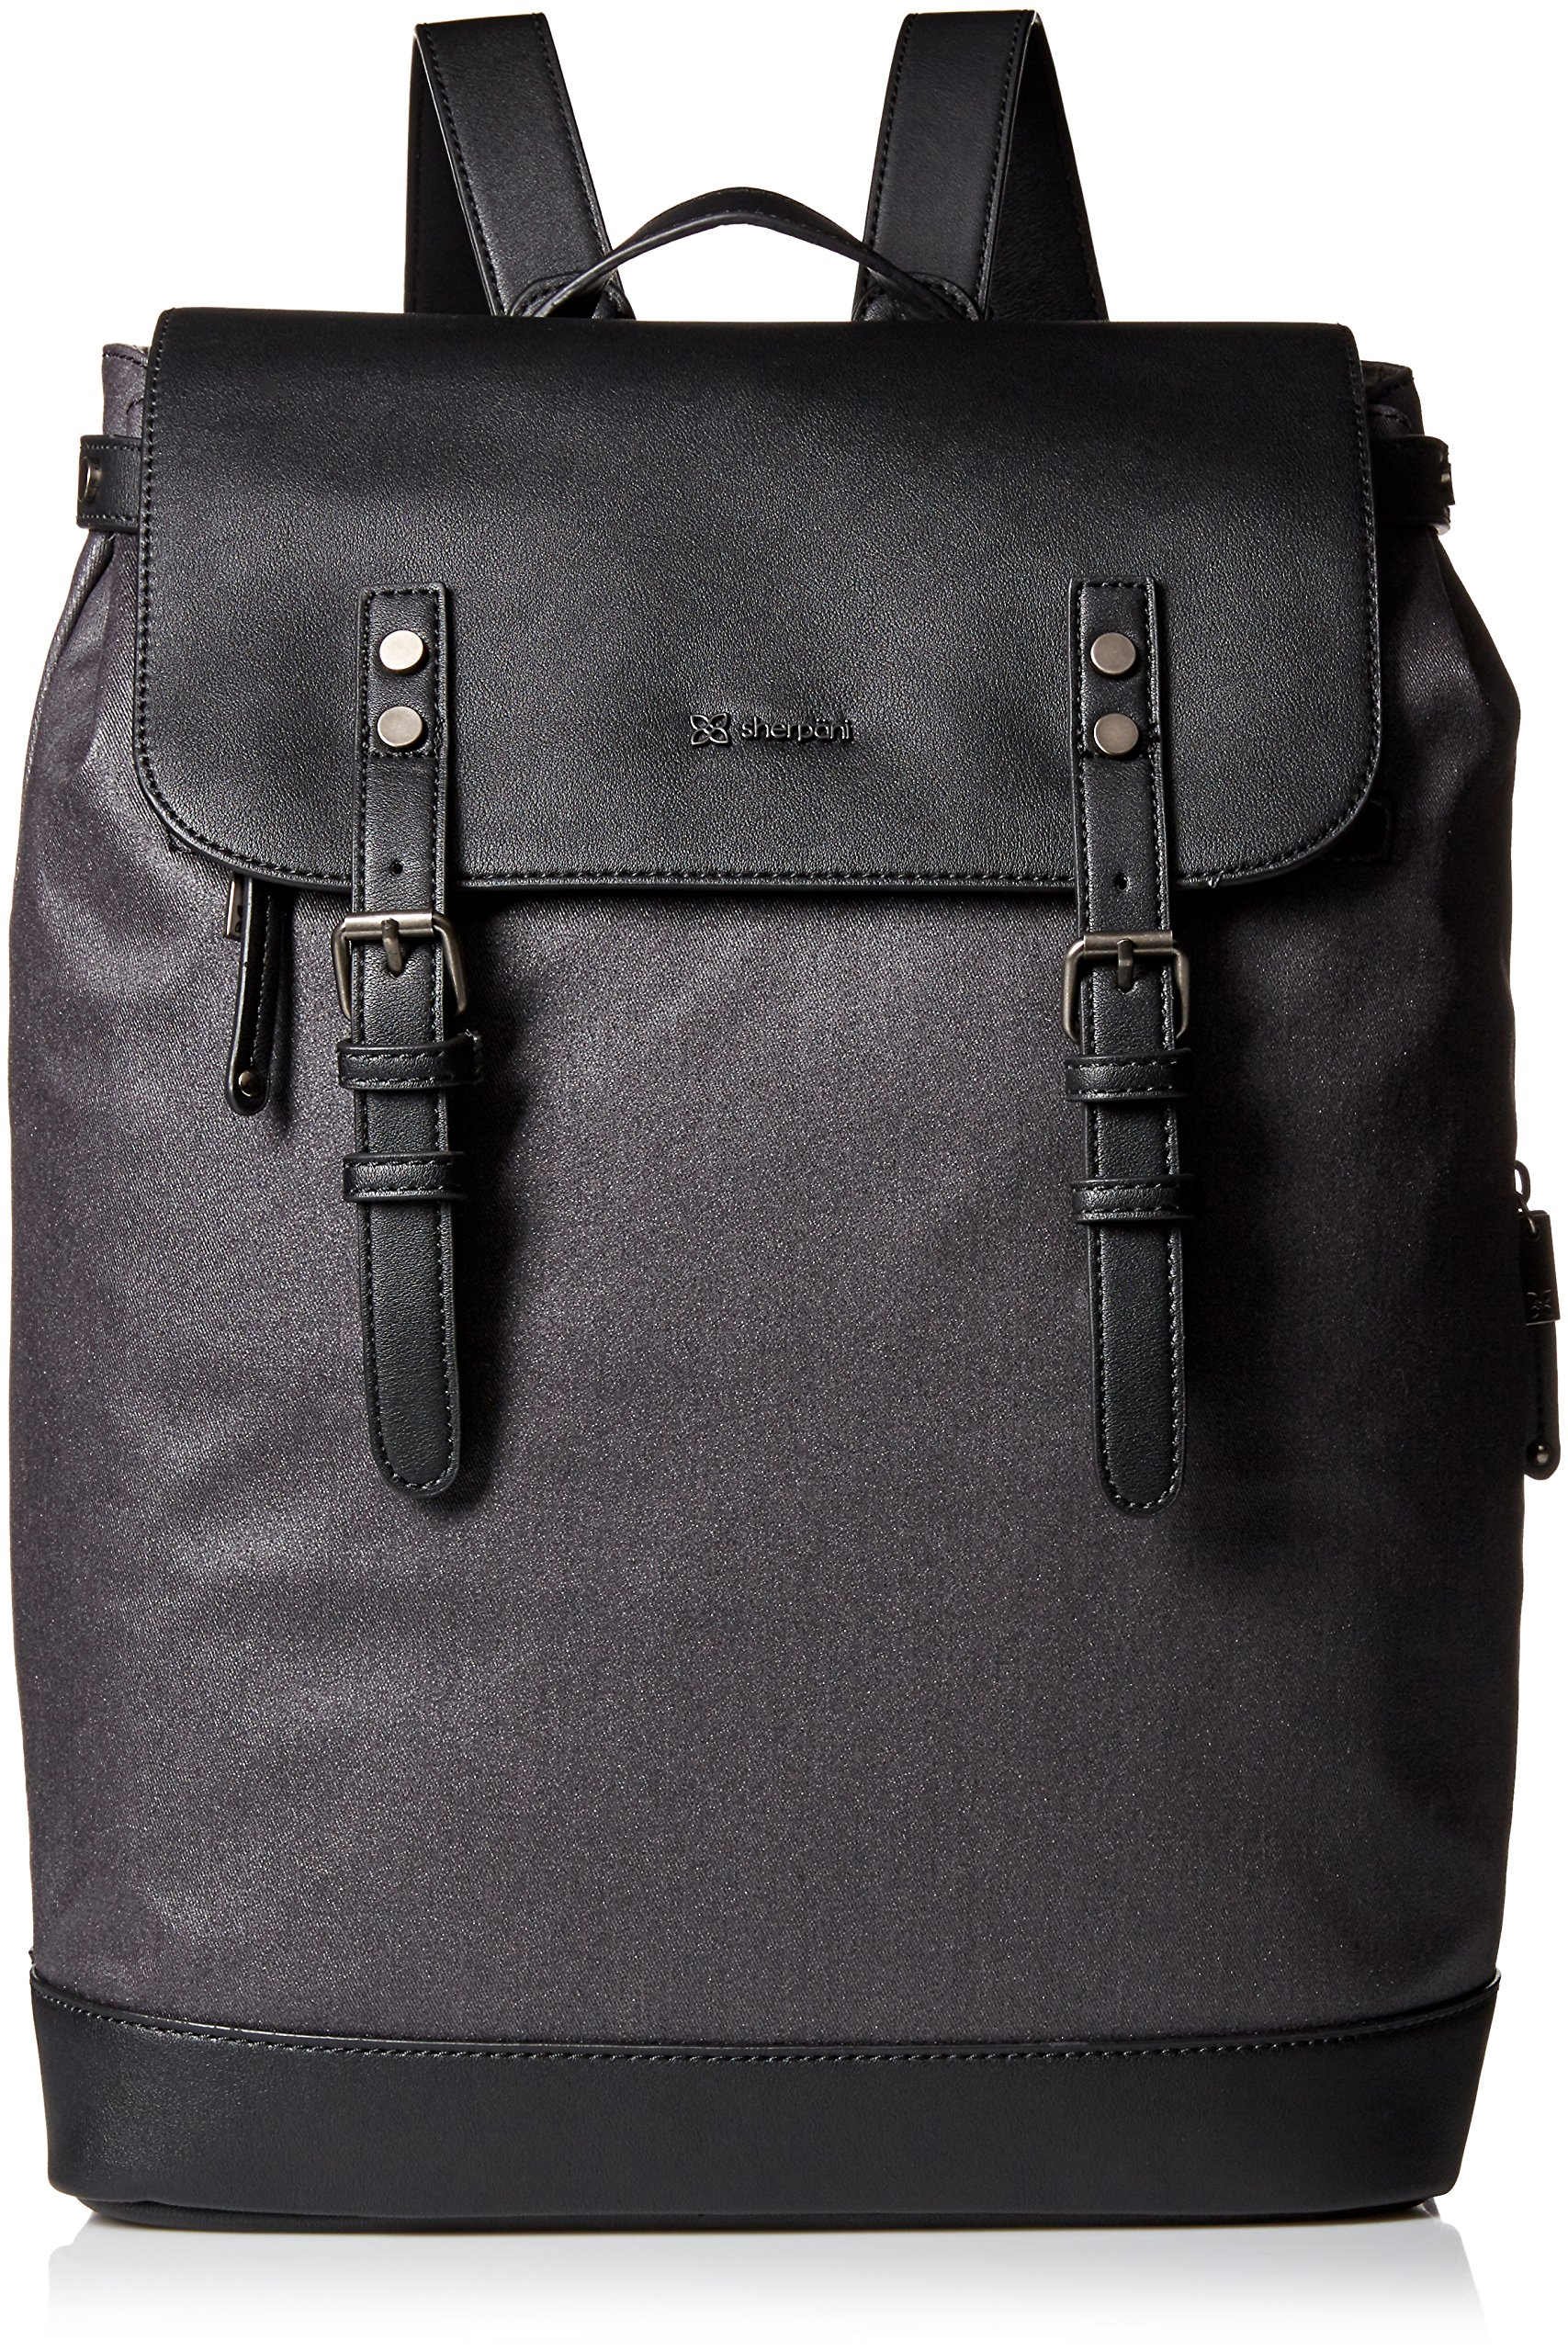 Sherpani Fixx Laptop Backpack, Black